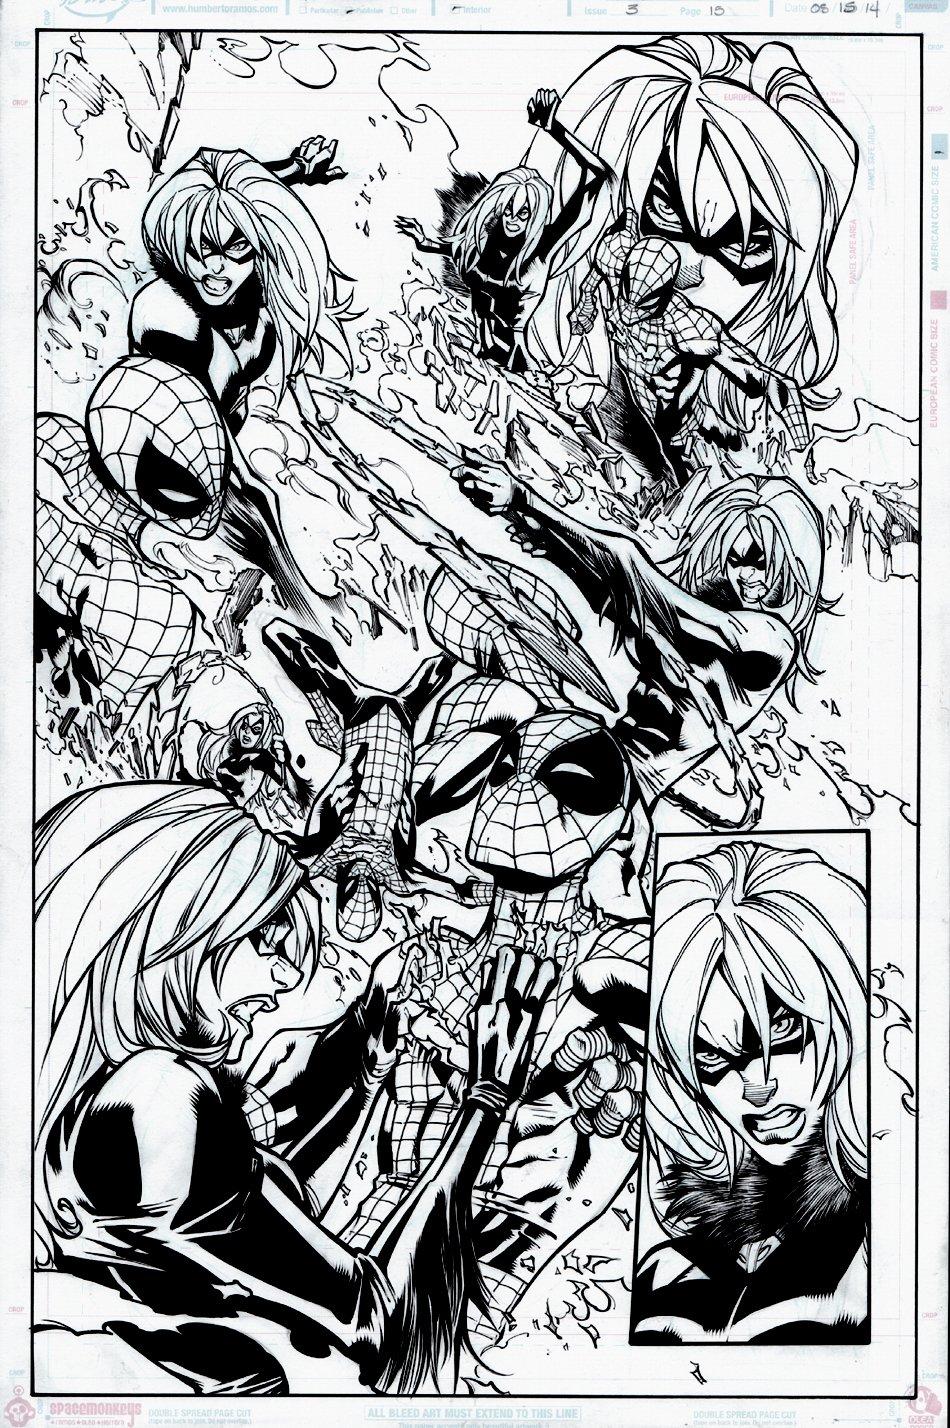 Amazing Spider-Man #3 p 15 SPLASH (Spider-Man Battling Black Cat) 2014